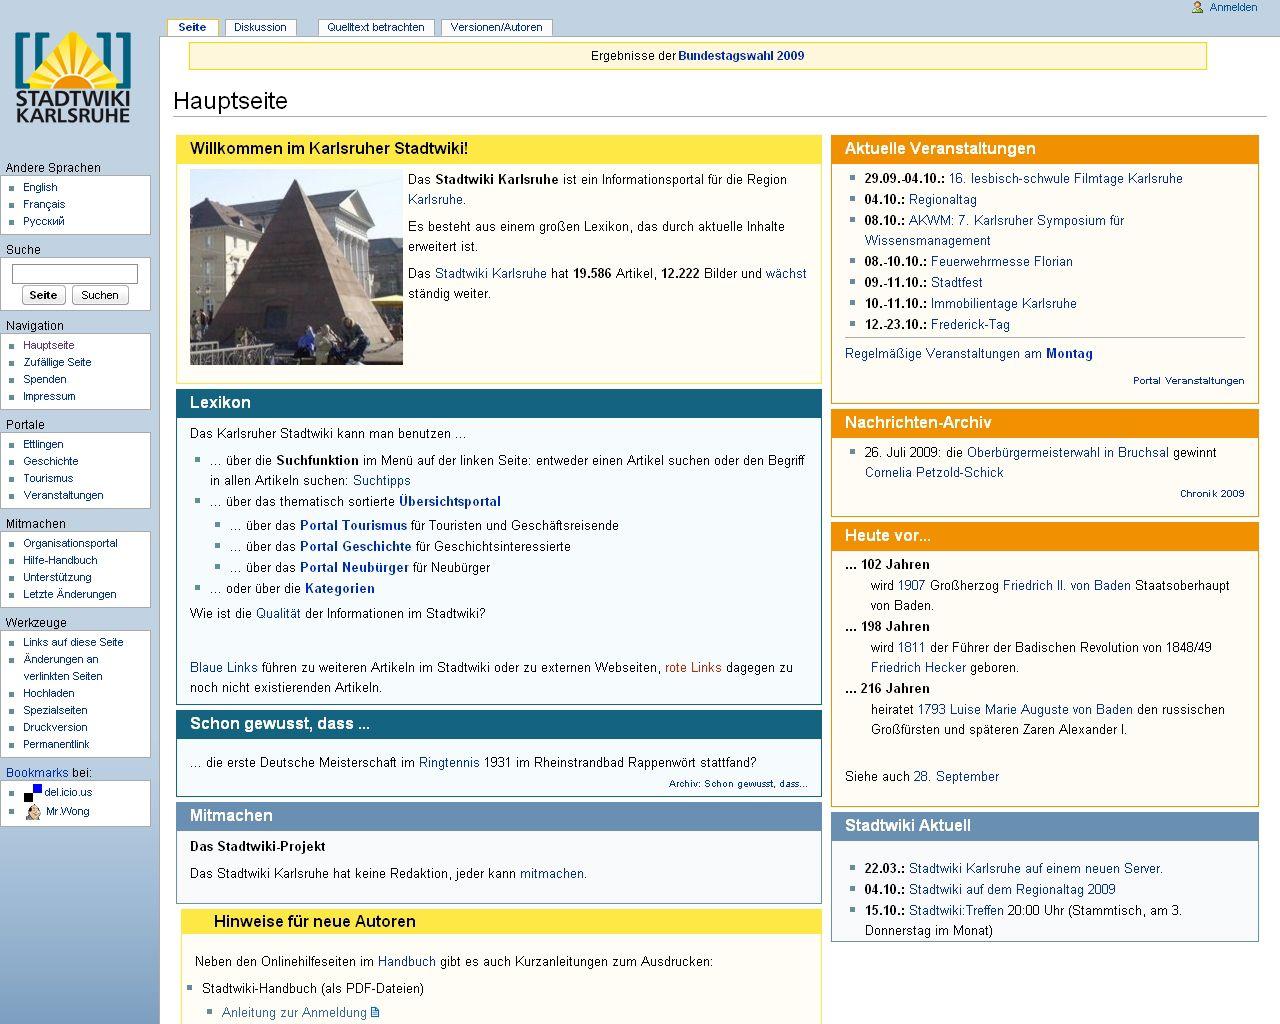 NUR ALS ZITAT Screenshot / Stadtwiki / Karlsruhe